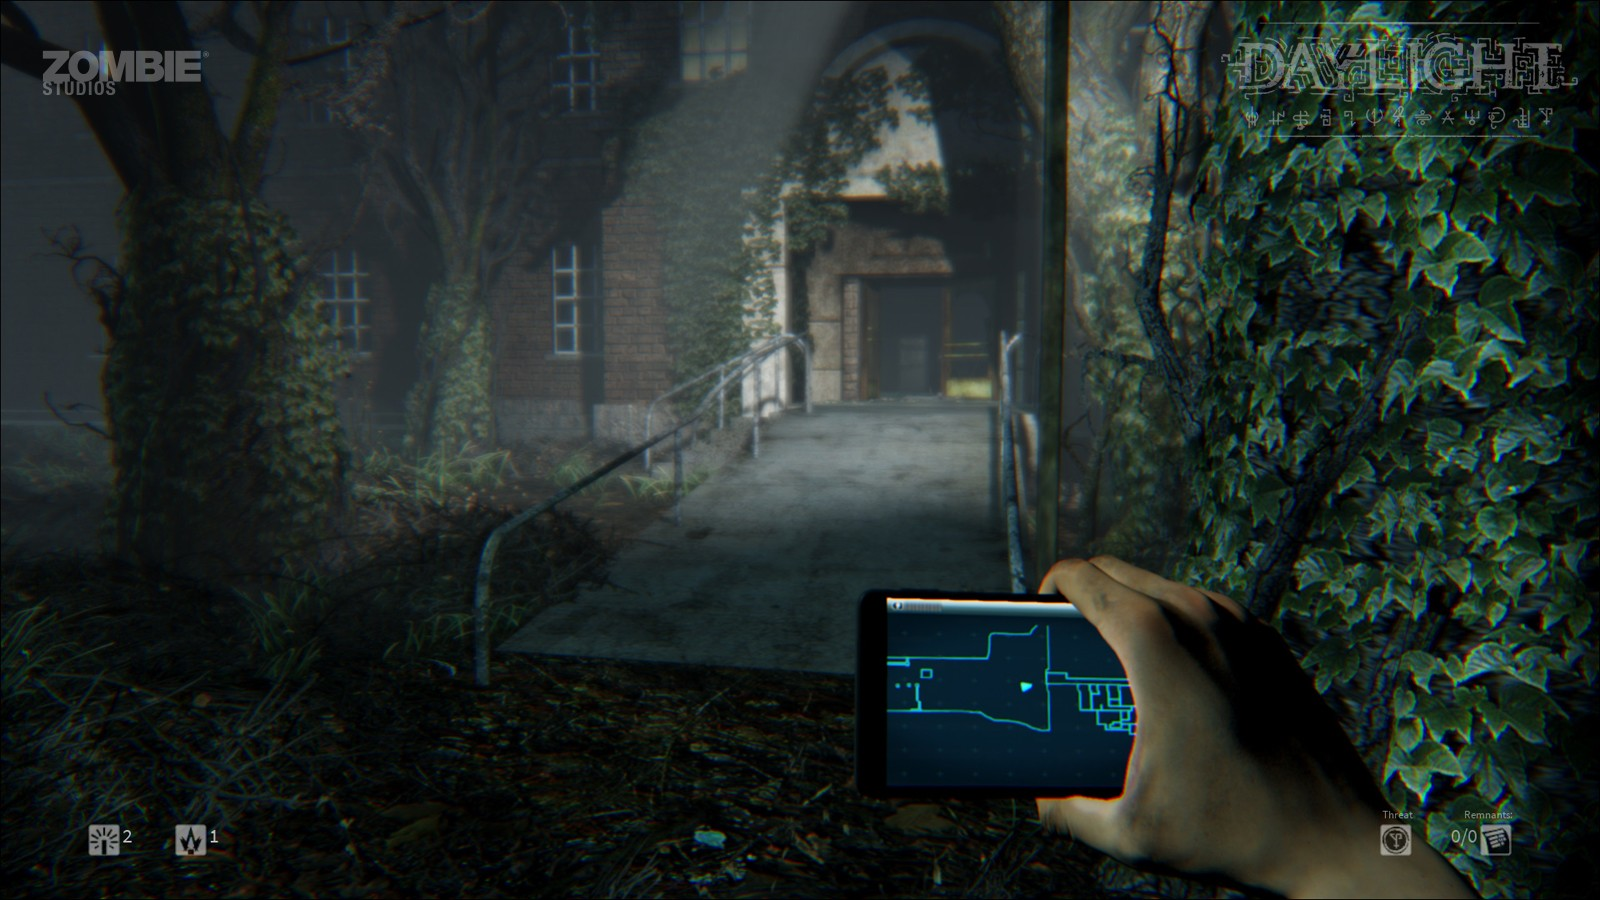 Daylight llegará a PS4 el día 8 de Abril Pgqr